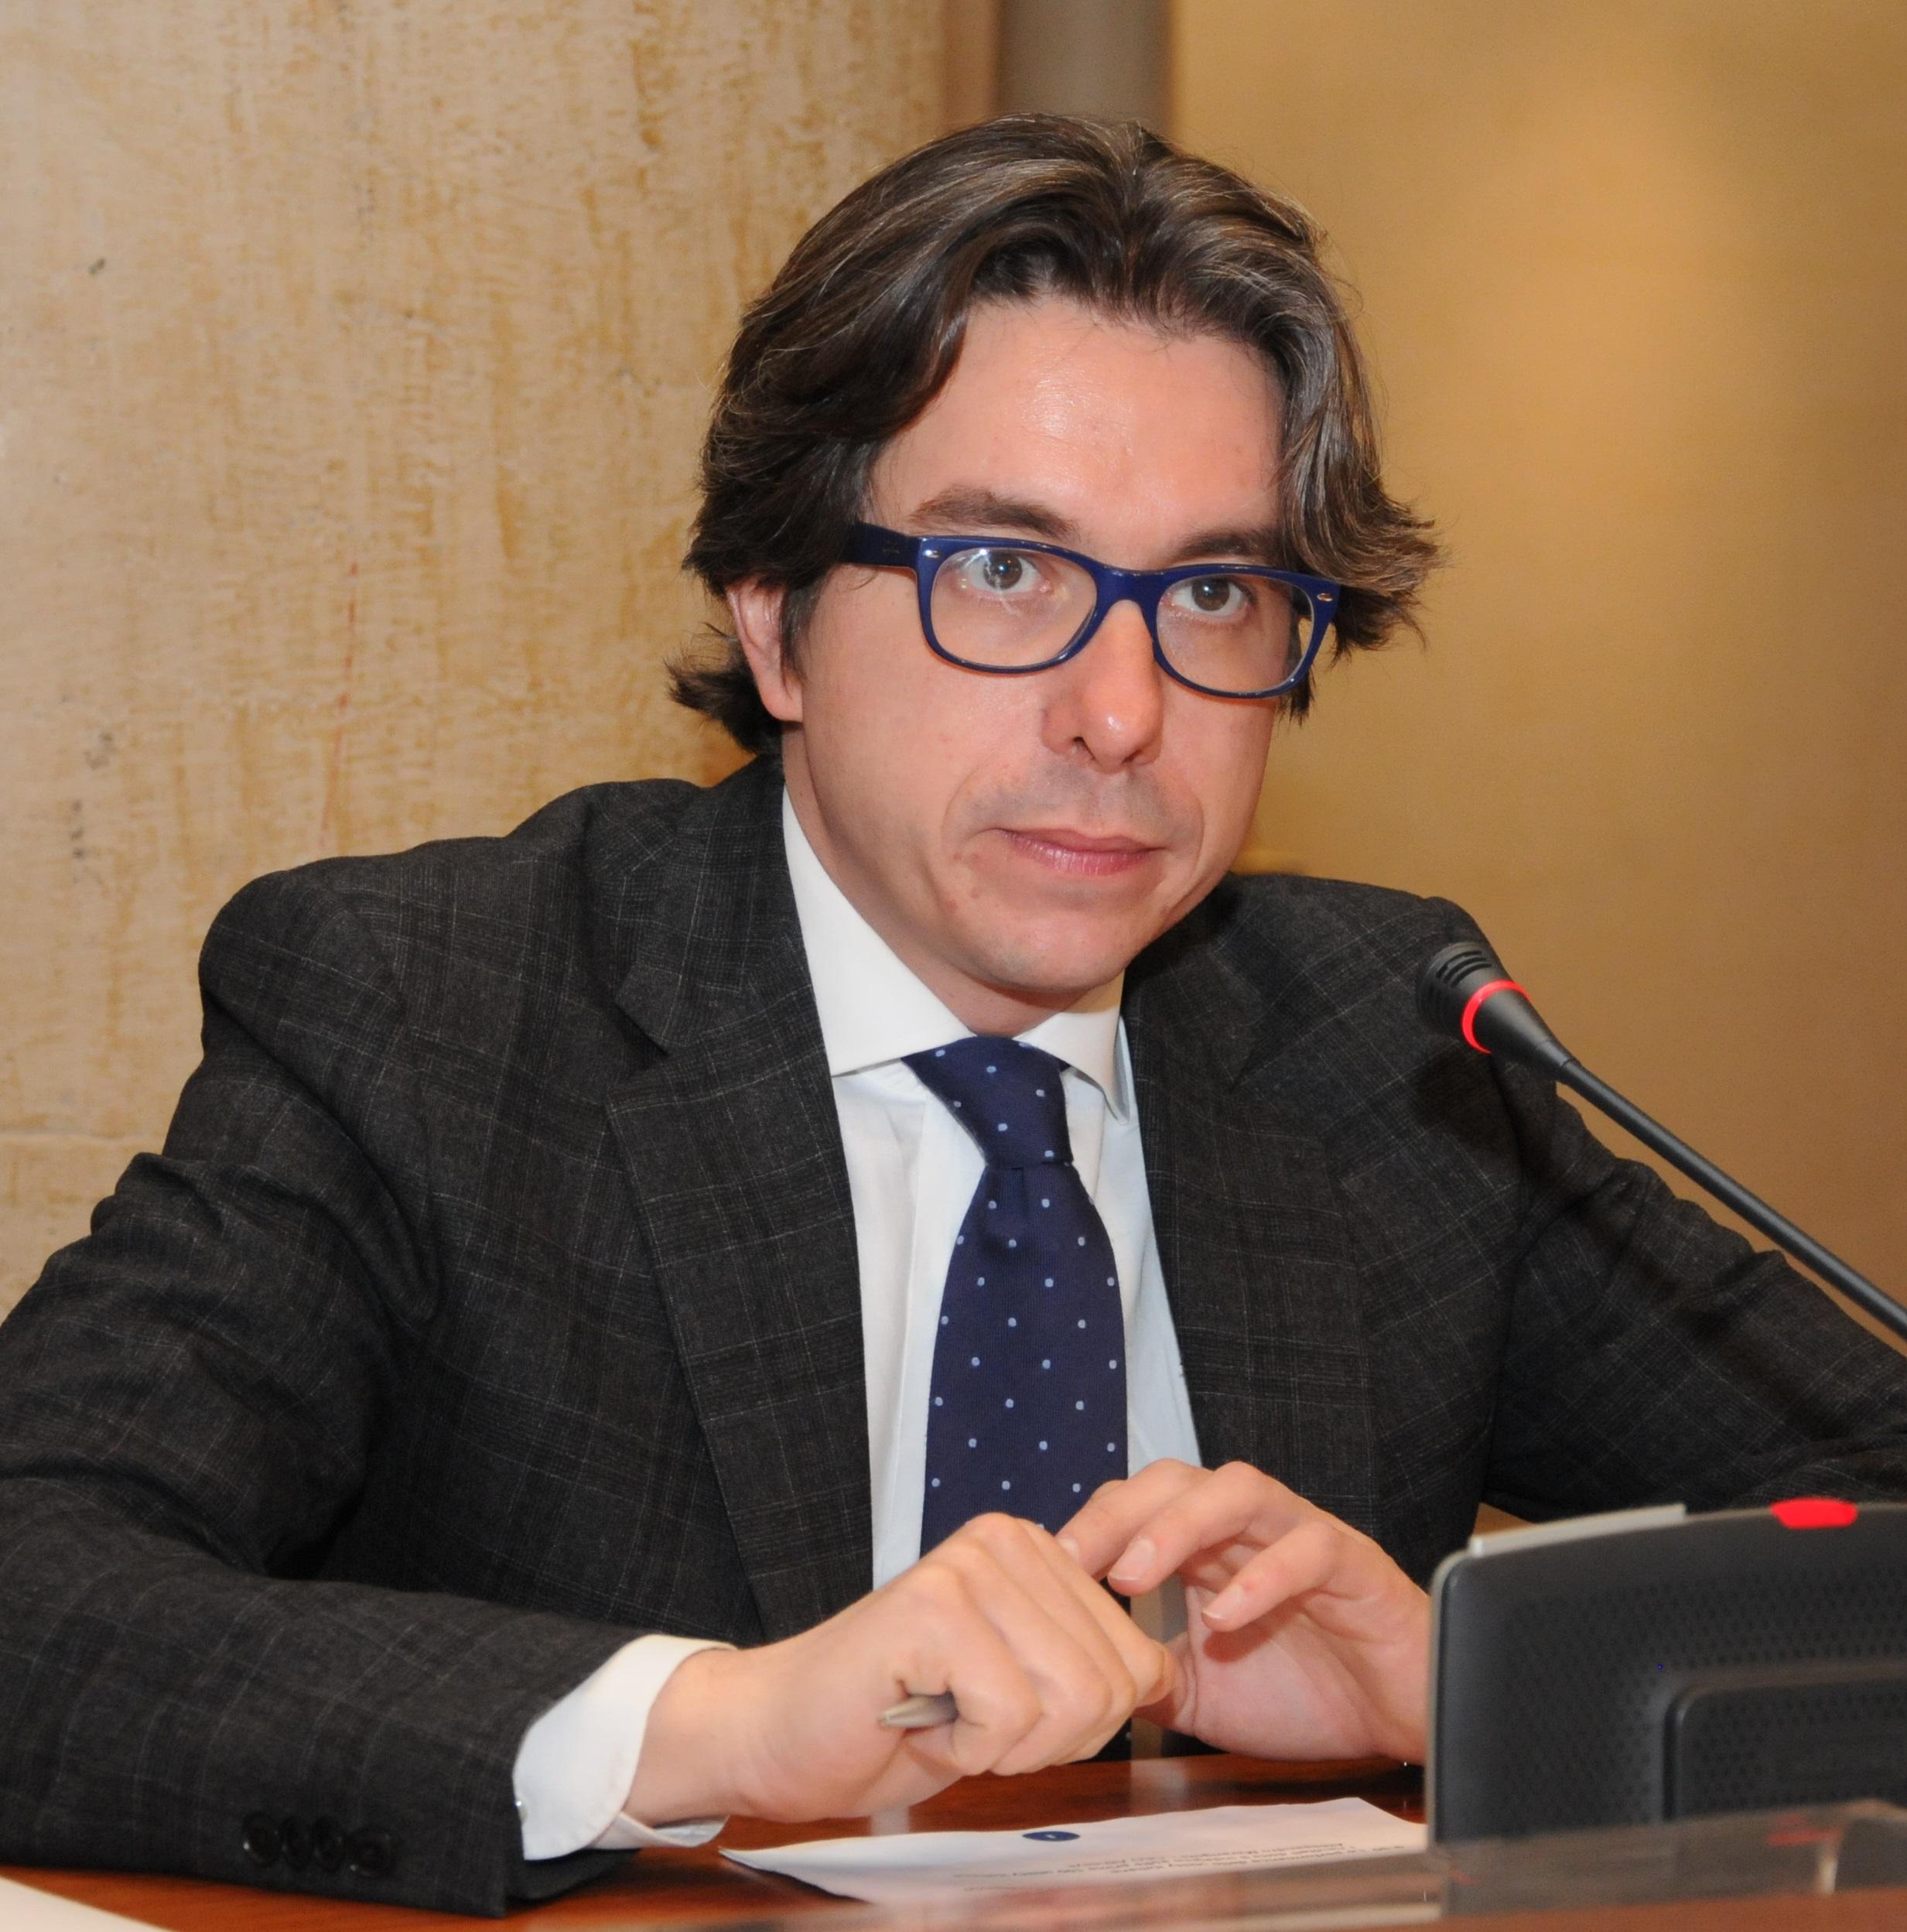 Gianni Trovati